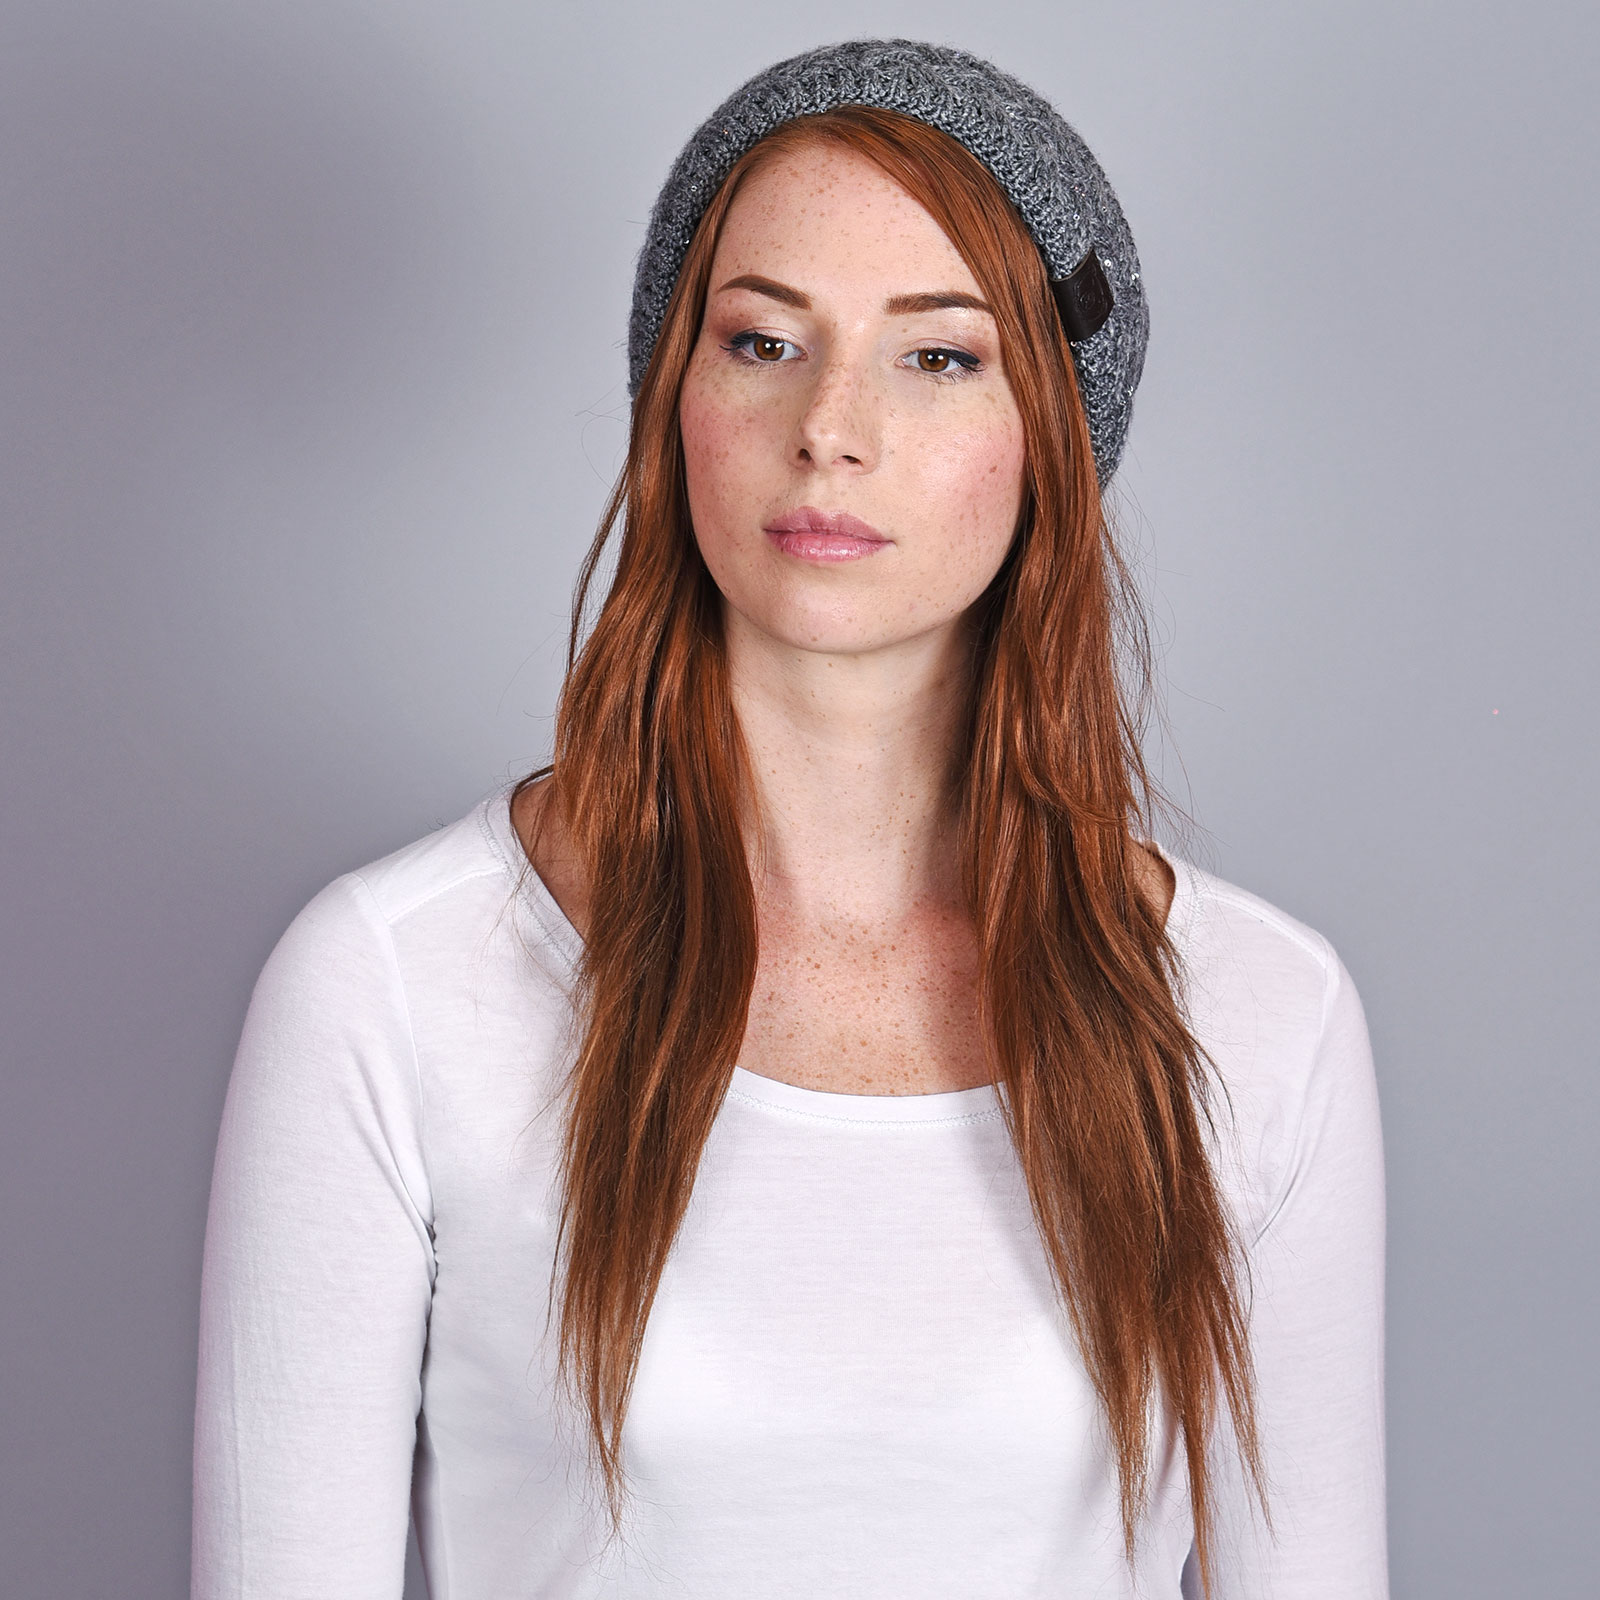 CP-01032-VF16-2-bonnet-femme-mode-gris-anthracite